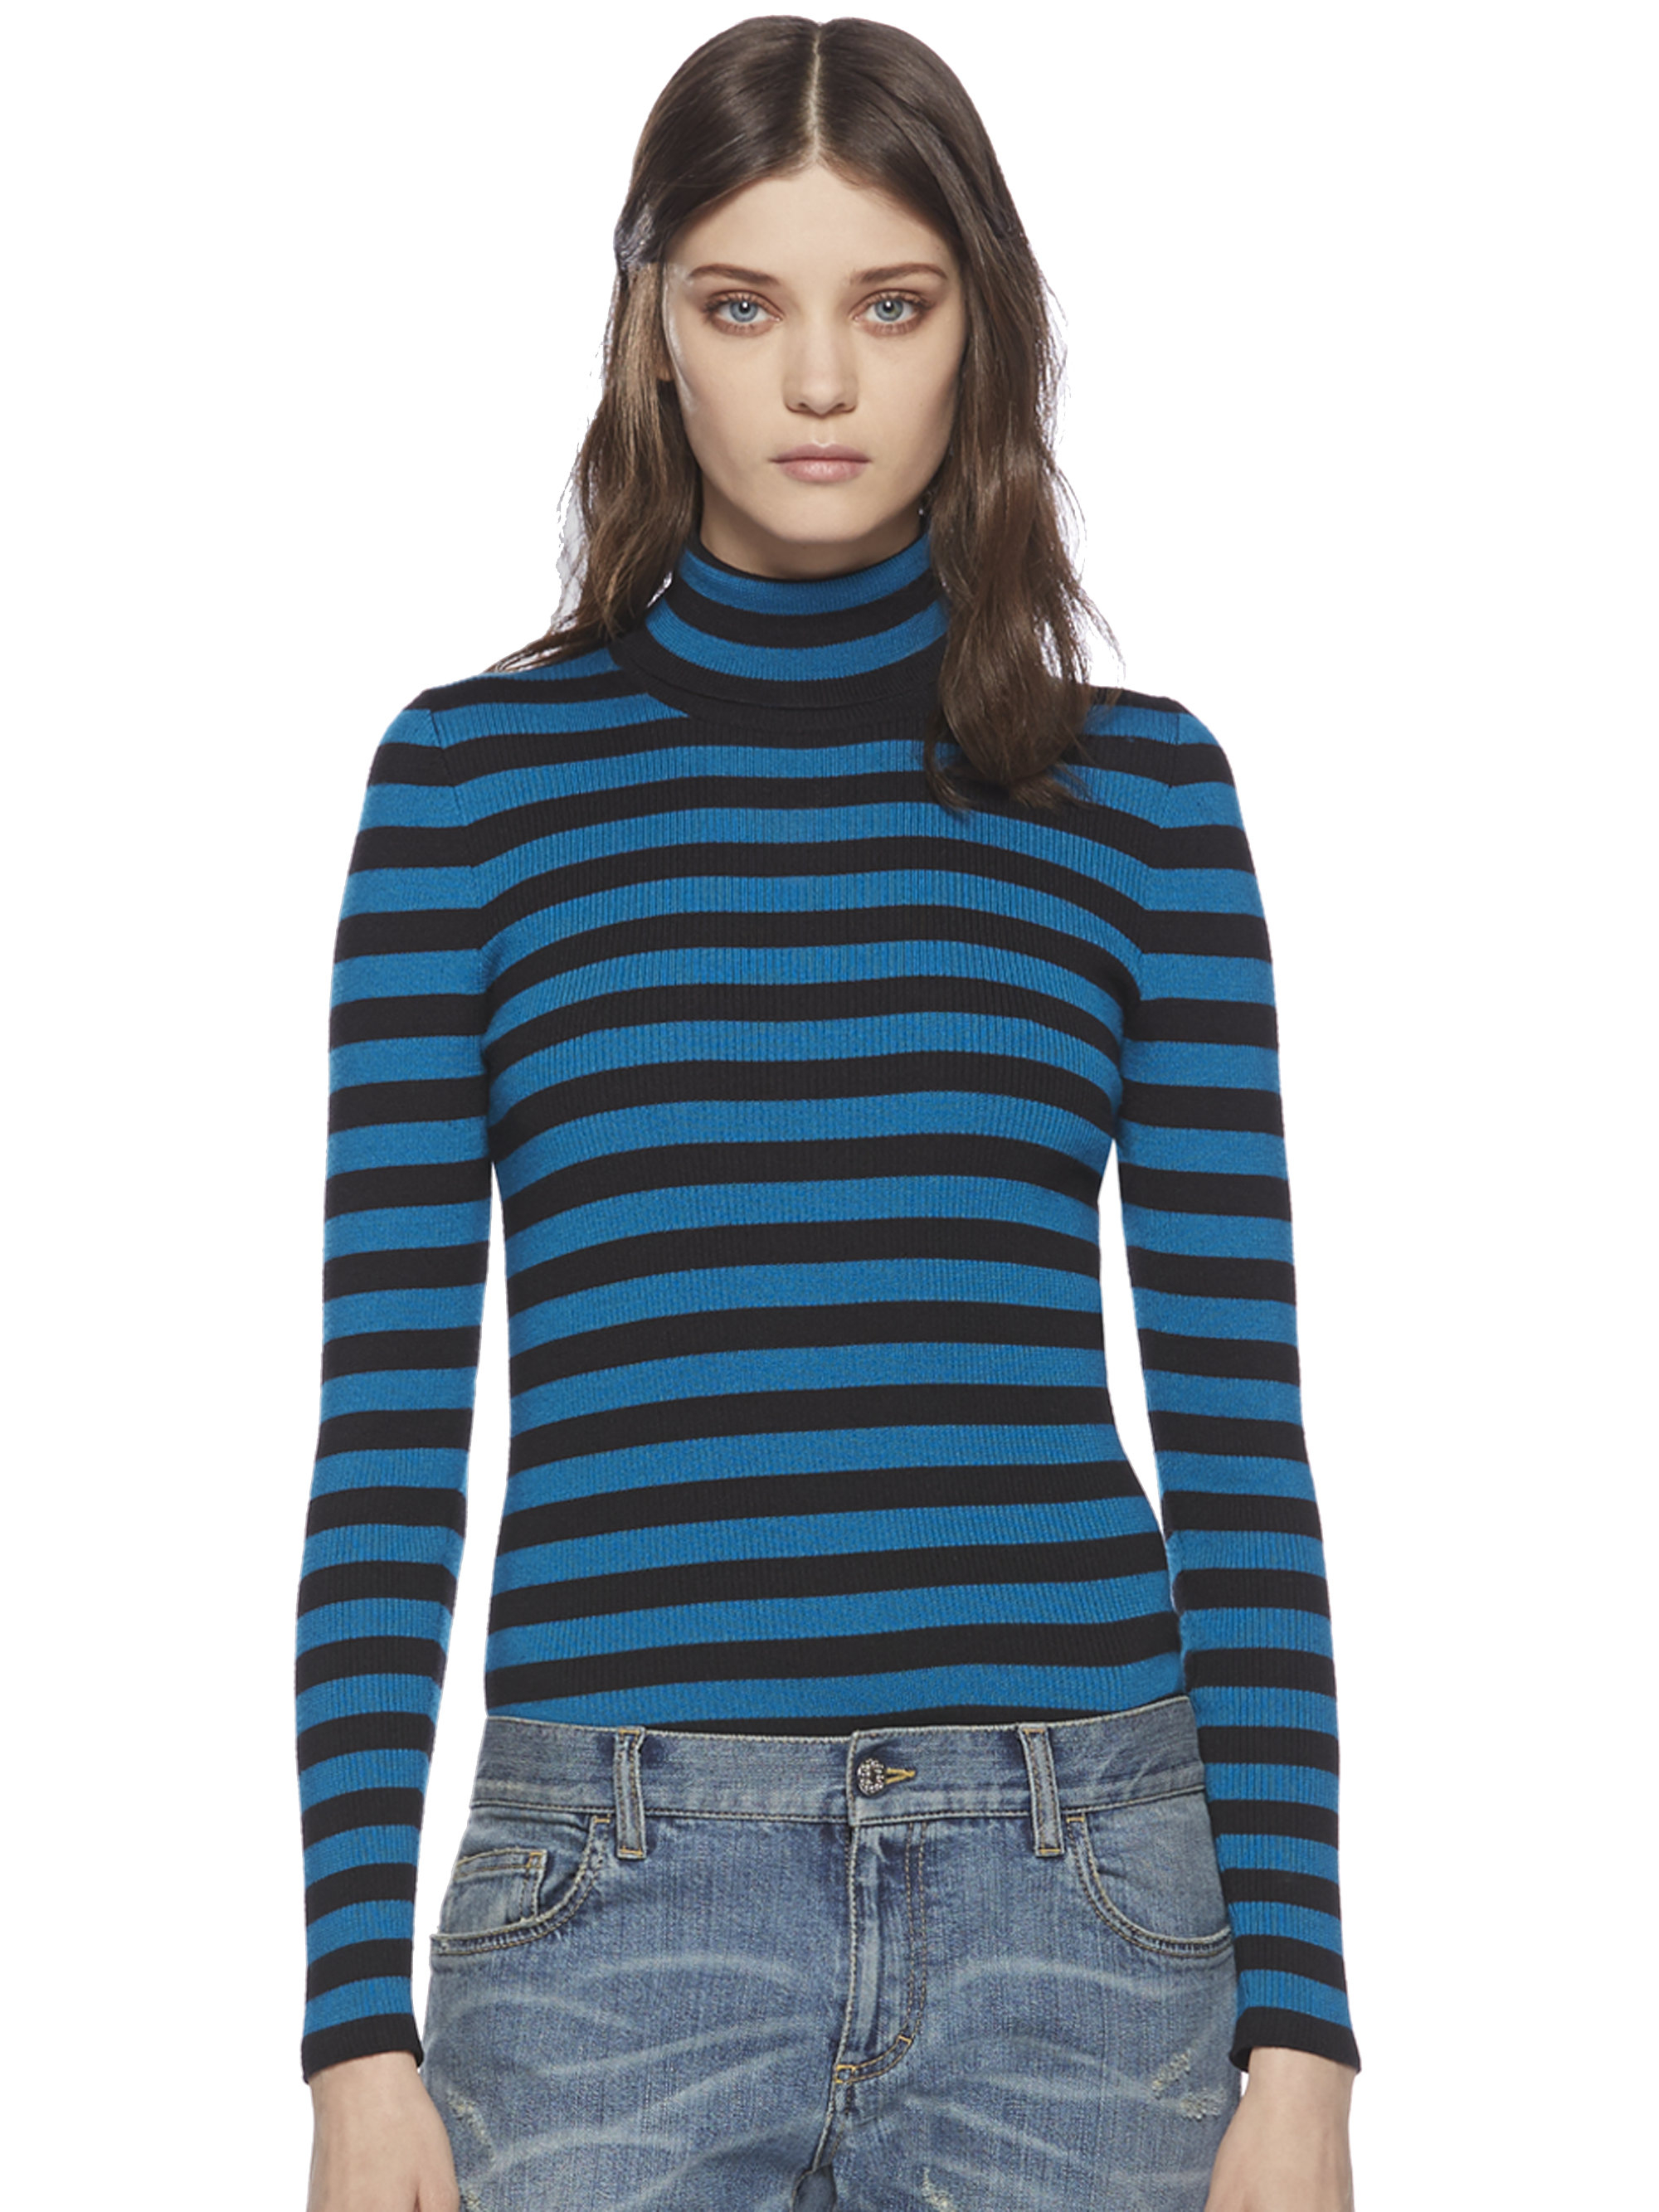 Blue Turtleneck Sweater Womens Her Sweater